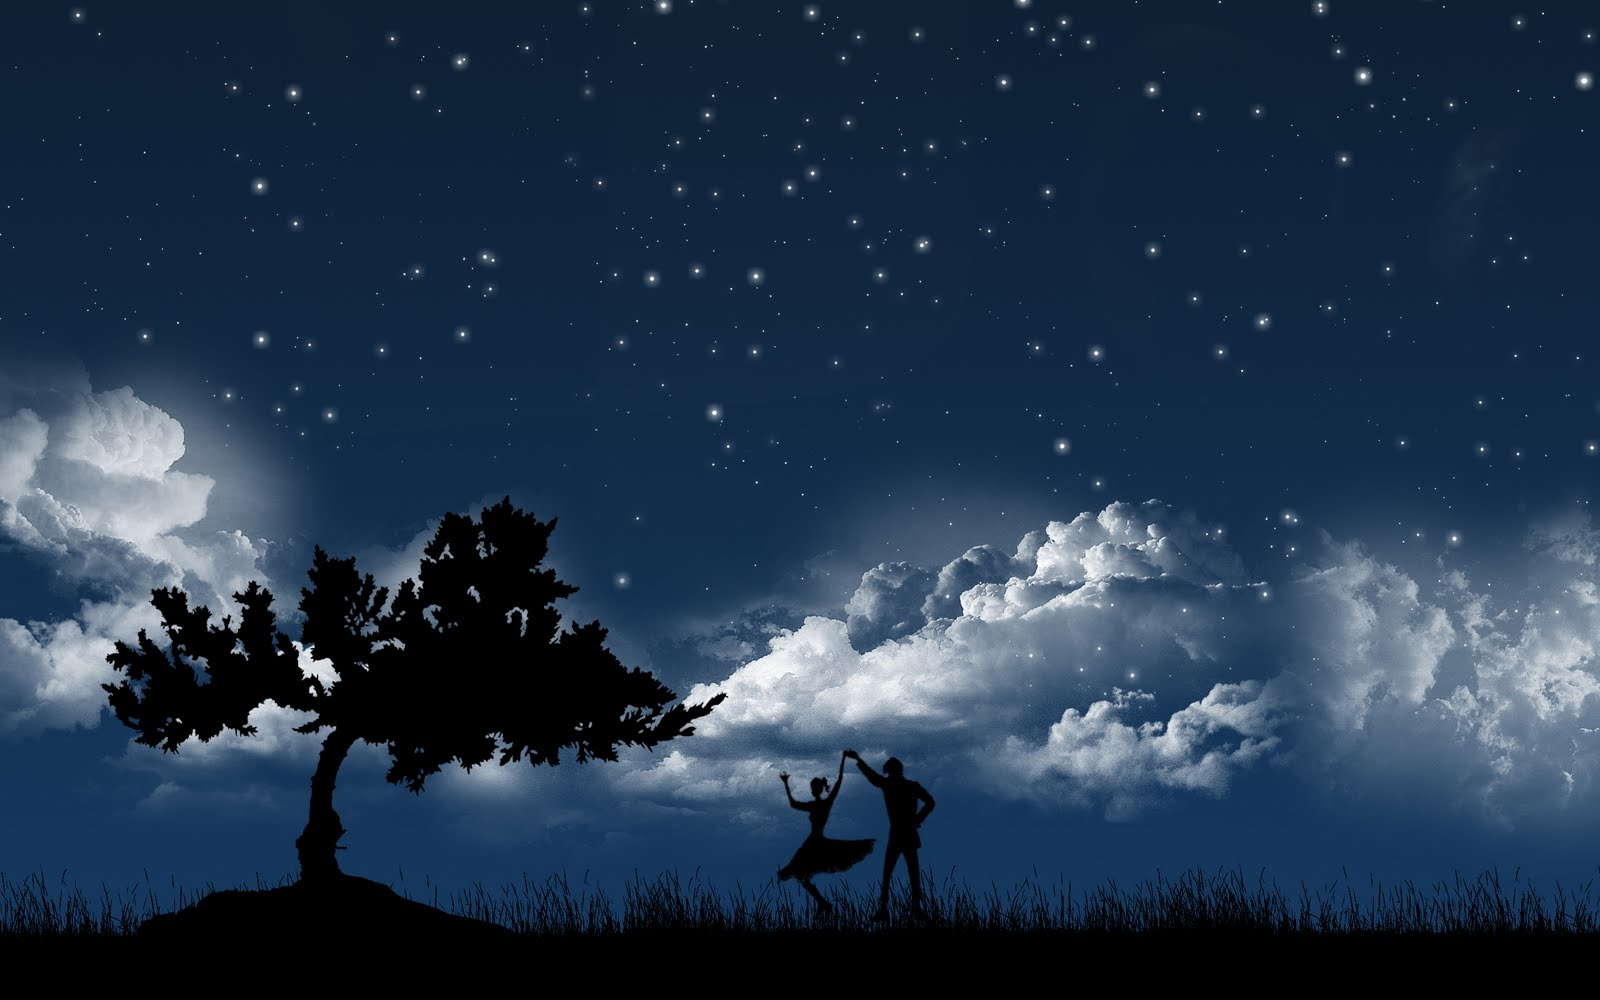 http://1.bp.blogspot.com/-6OVESLM1ZZ8/TaUyoJrlECI/AAAAAAAAAiY/Fzf4-DeOVdo/s1600/ws_Dancing_in_Moonlight_2560x1600.jpg